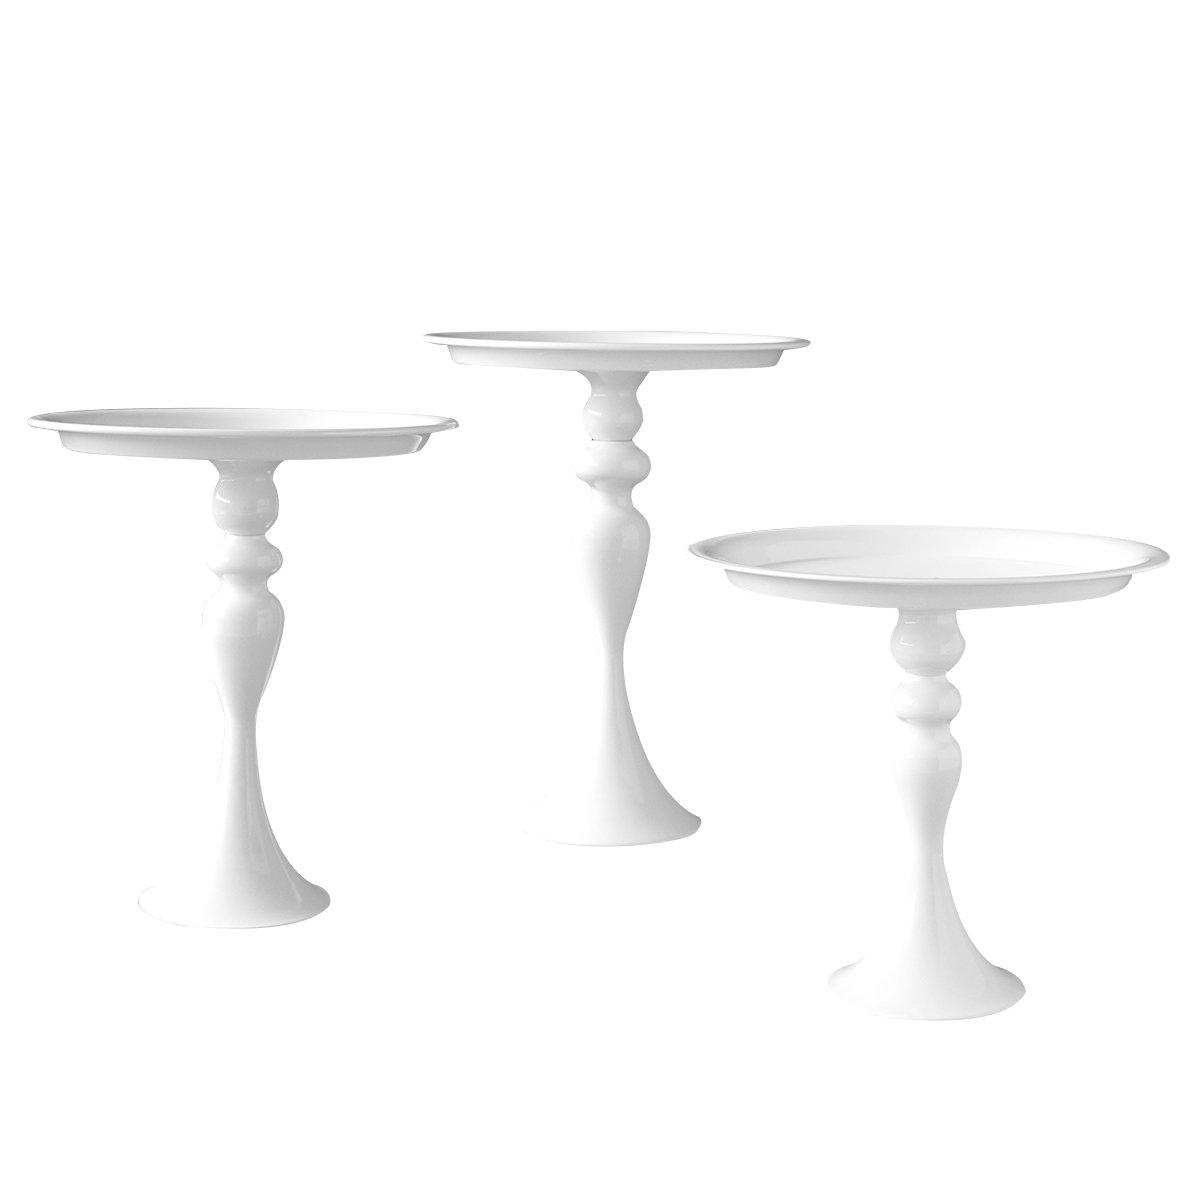 VILAVITA Cake Stands 3-Set Round Cupcake Stands with Simple Design, Dessert Cake Stand, White